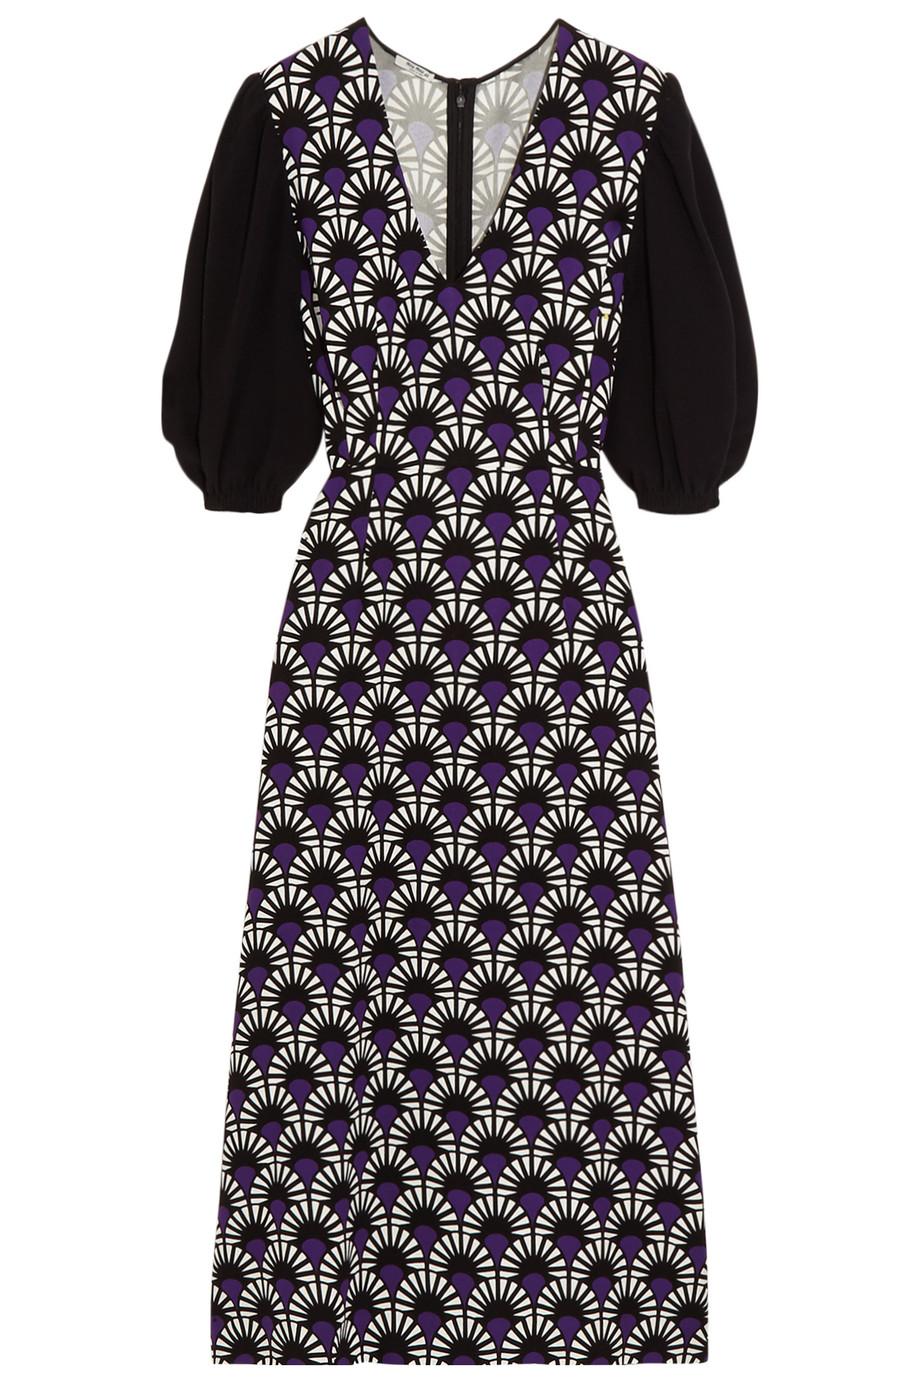 Miu Miu Printed Crepe Midi Dress, Purple, Women's - Printed, Size: 36